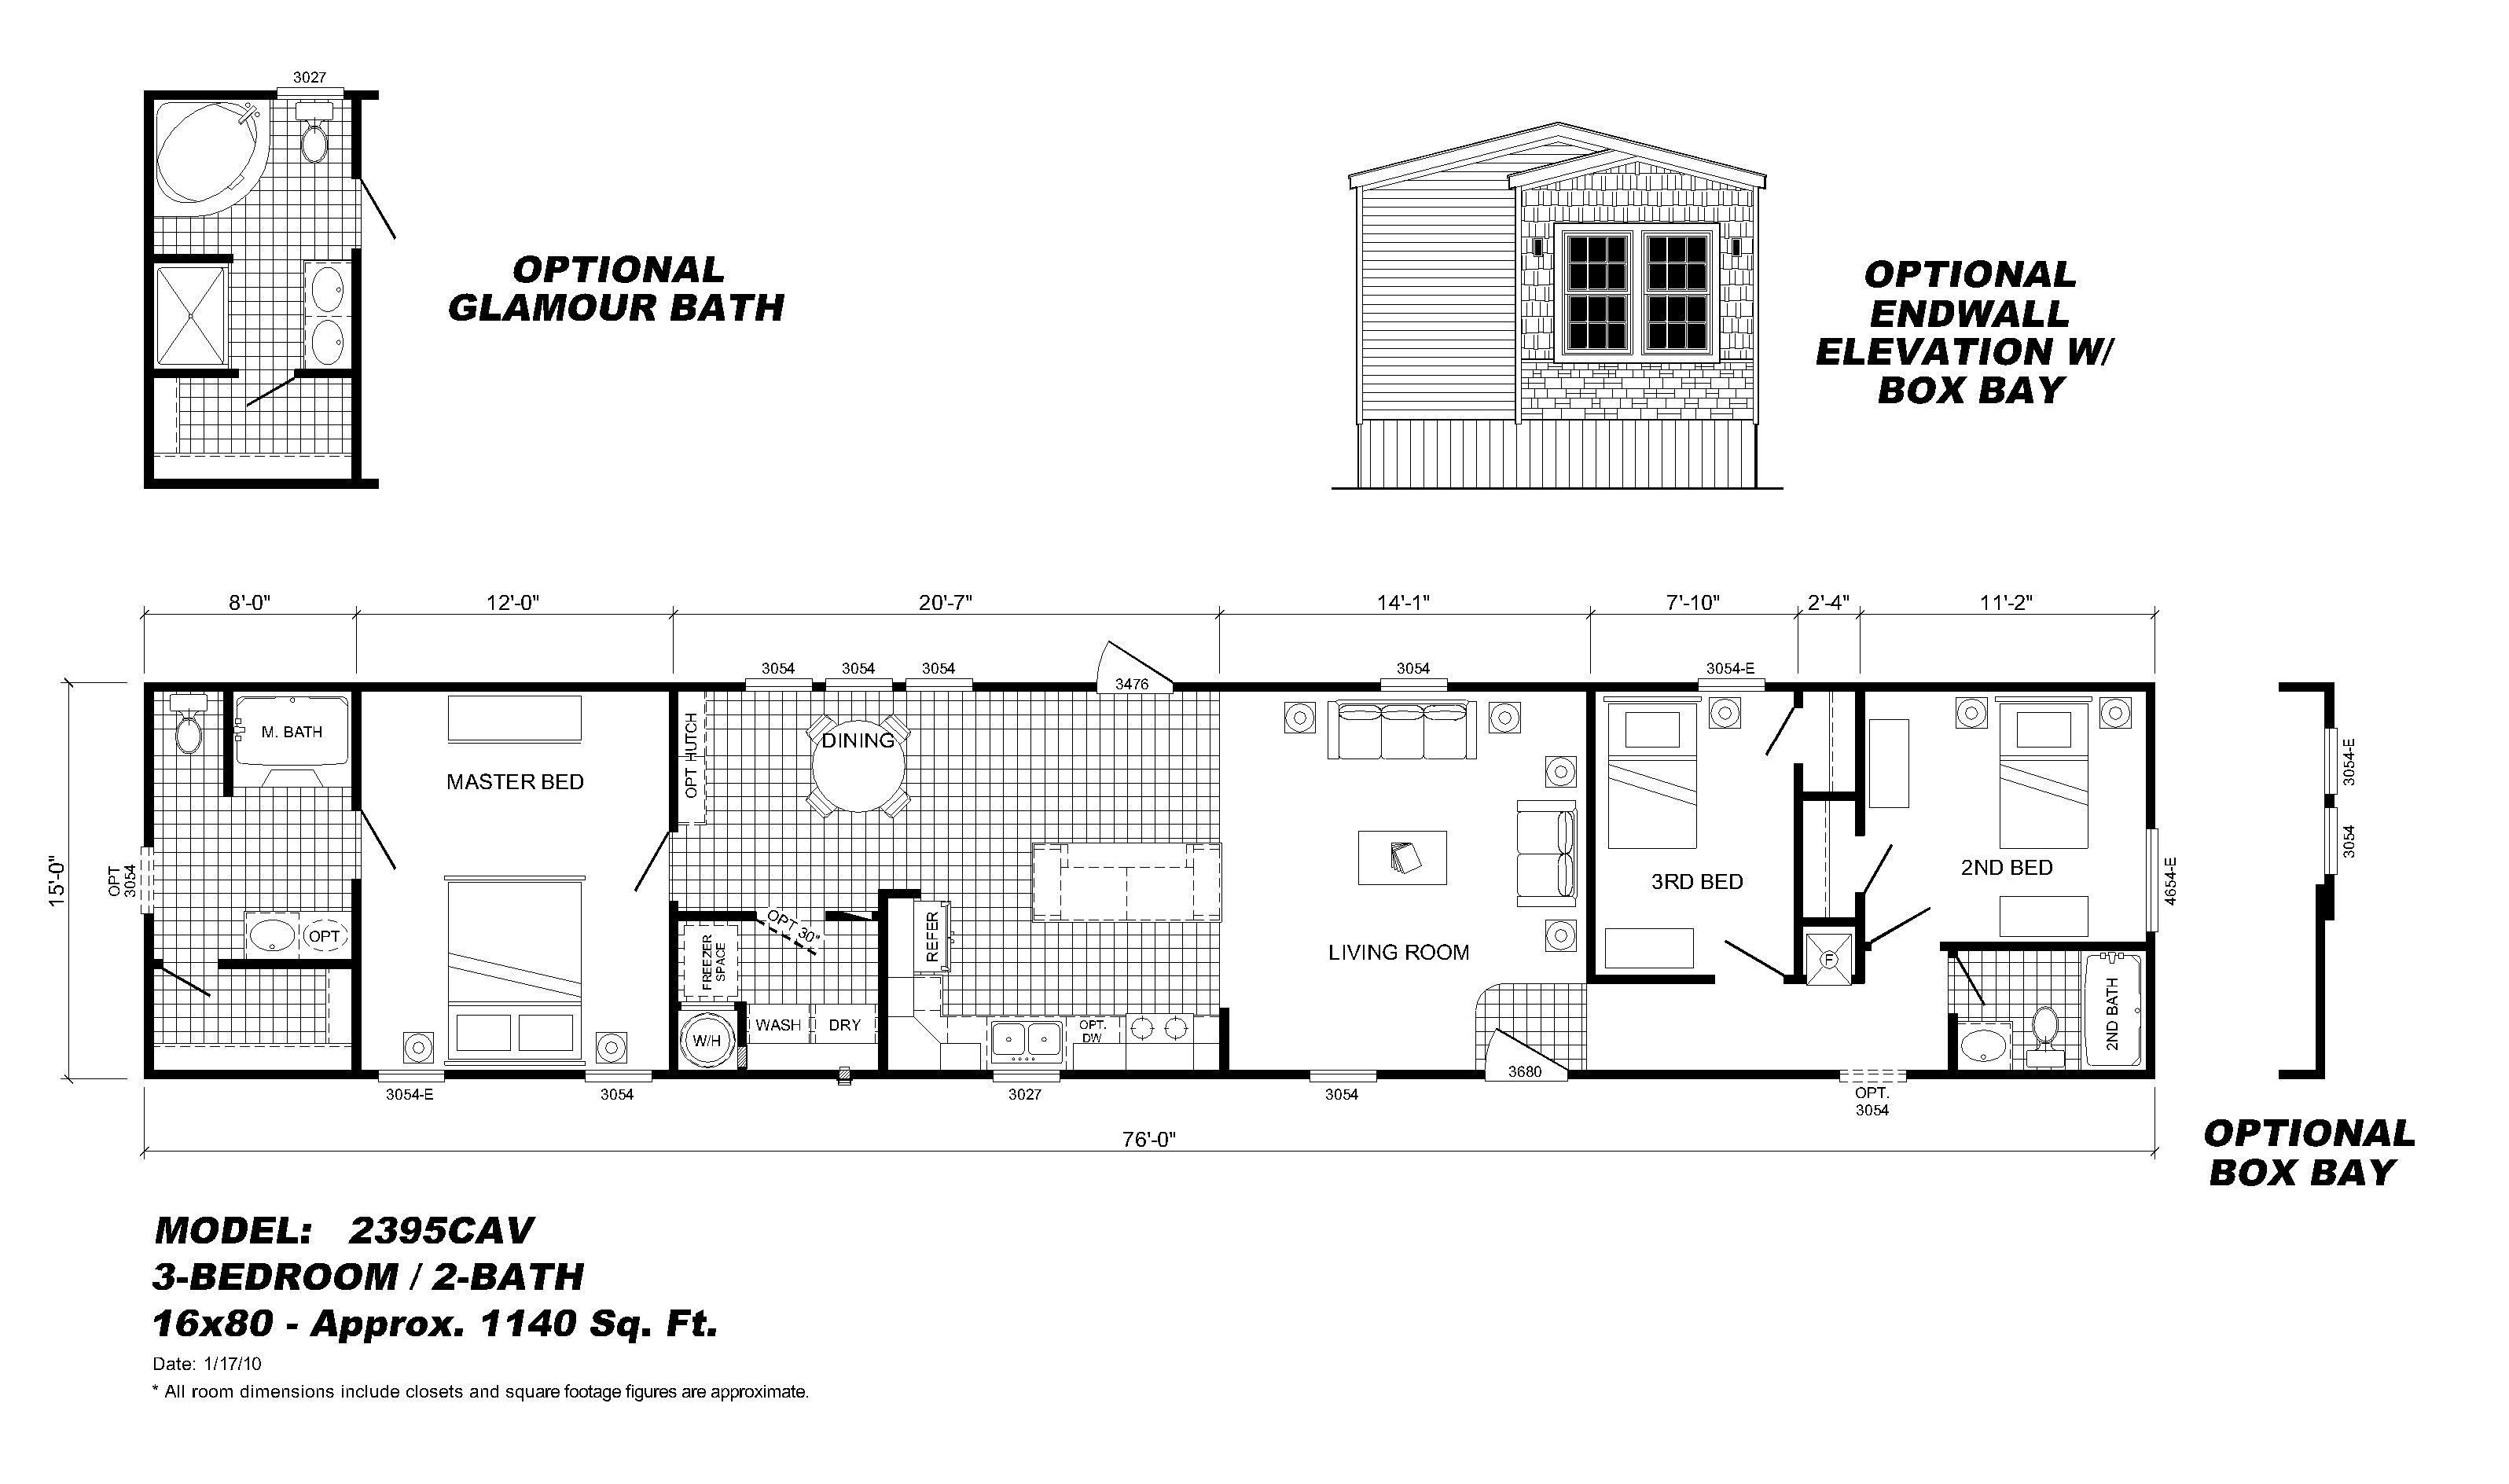 New Wiring Diagram Mobile Home Diagram Diagramsample Diagramtemplate Wiringdiagram Manufactured Homes Floor Plans Mobile Home Floor Plans House Floor Plans